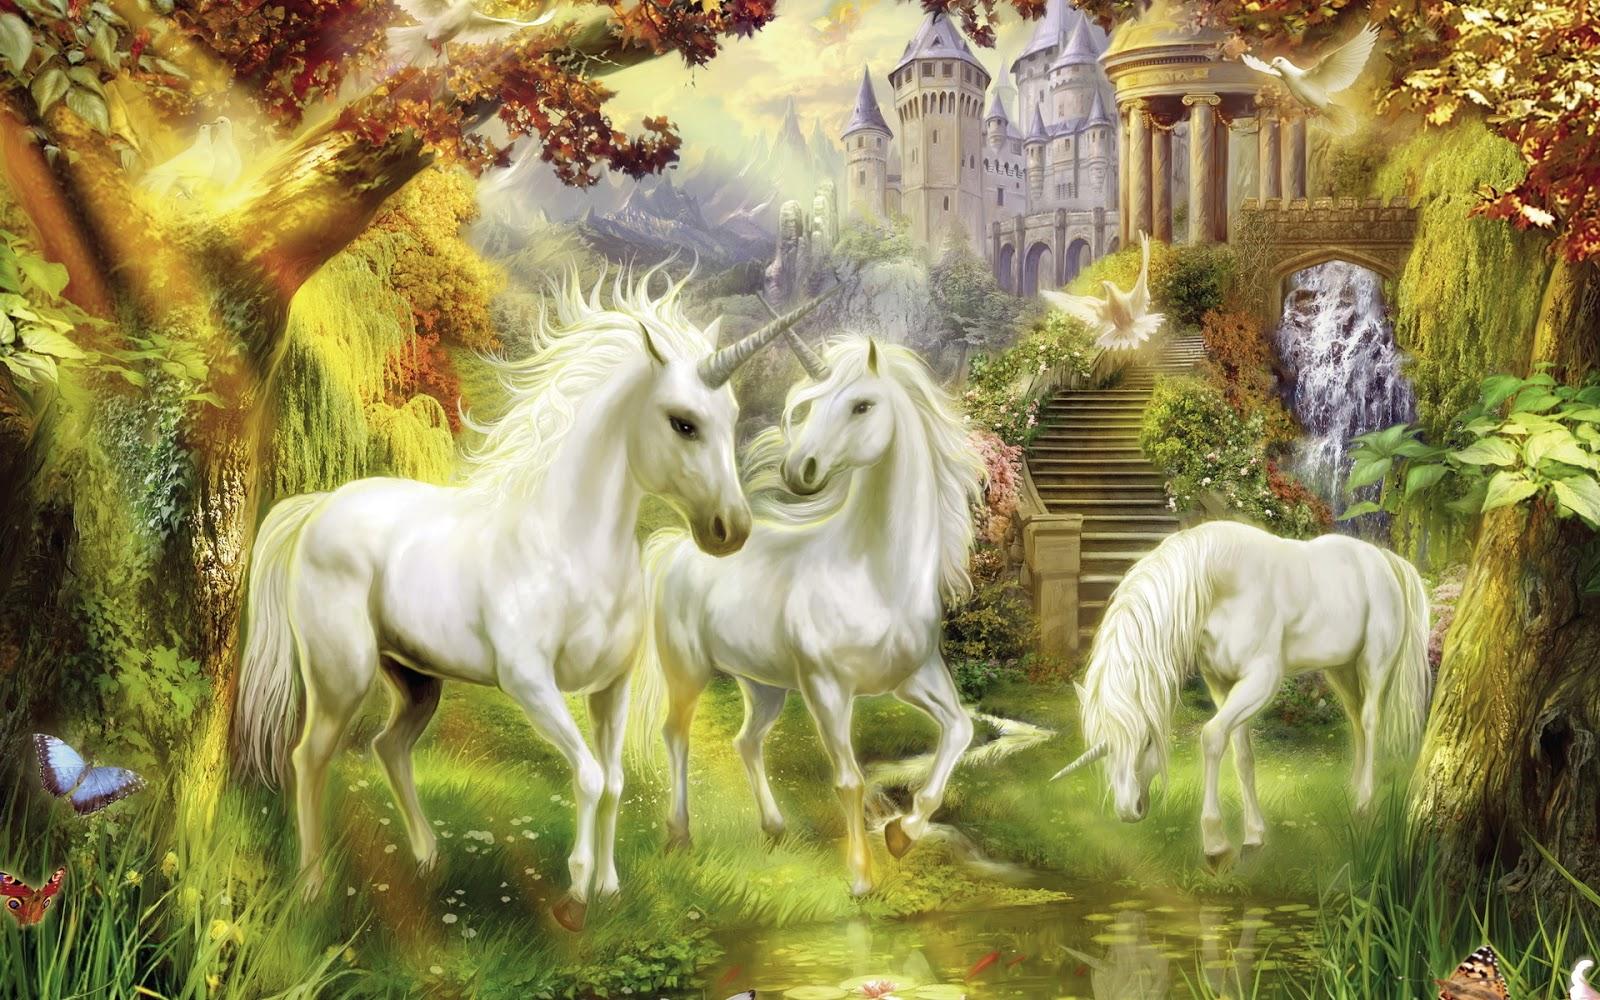 Wonderful   Wallpaper Horse Unicorn - 9d71d9494eef76c0f3029a1ef0739cf9  Perfect Image Reference_869573.jpg